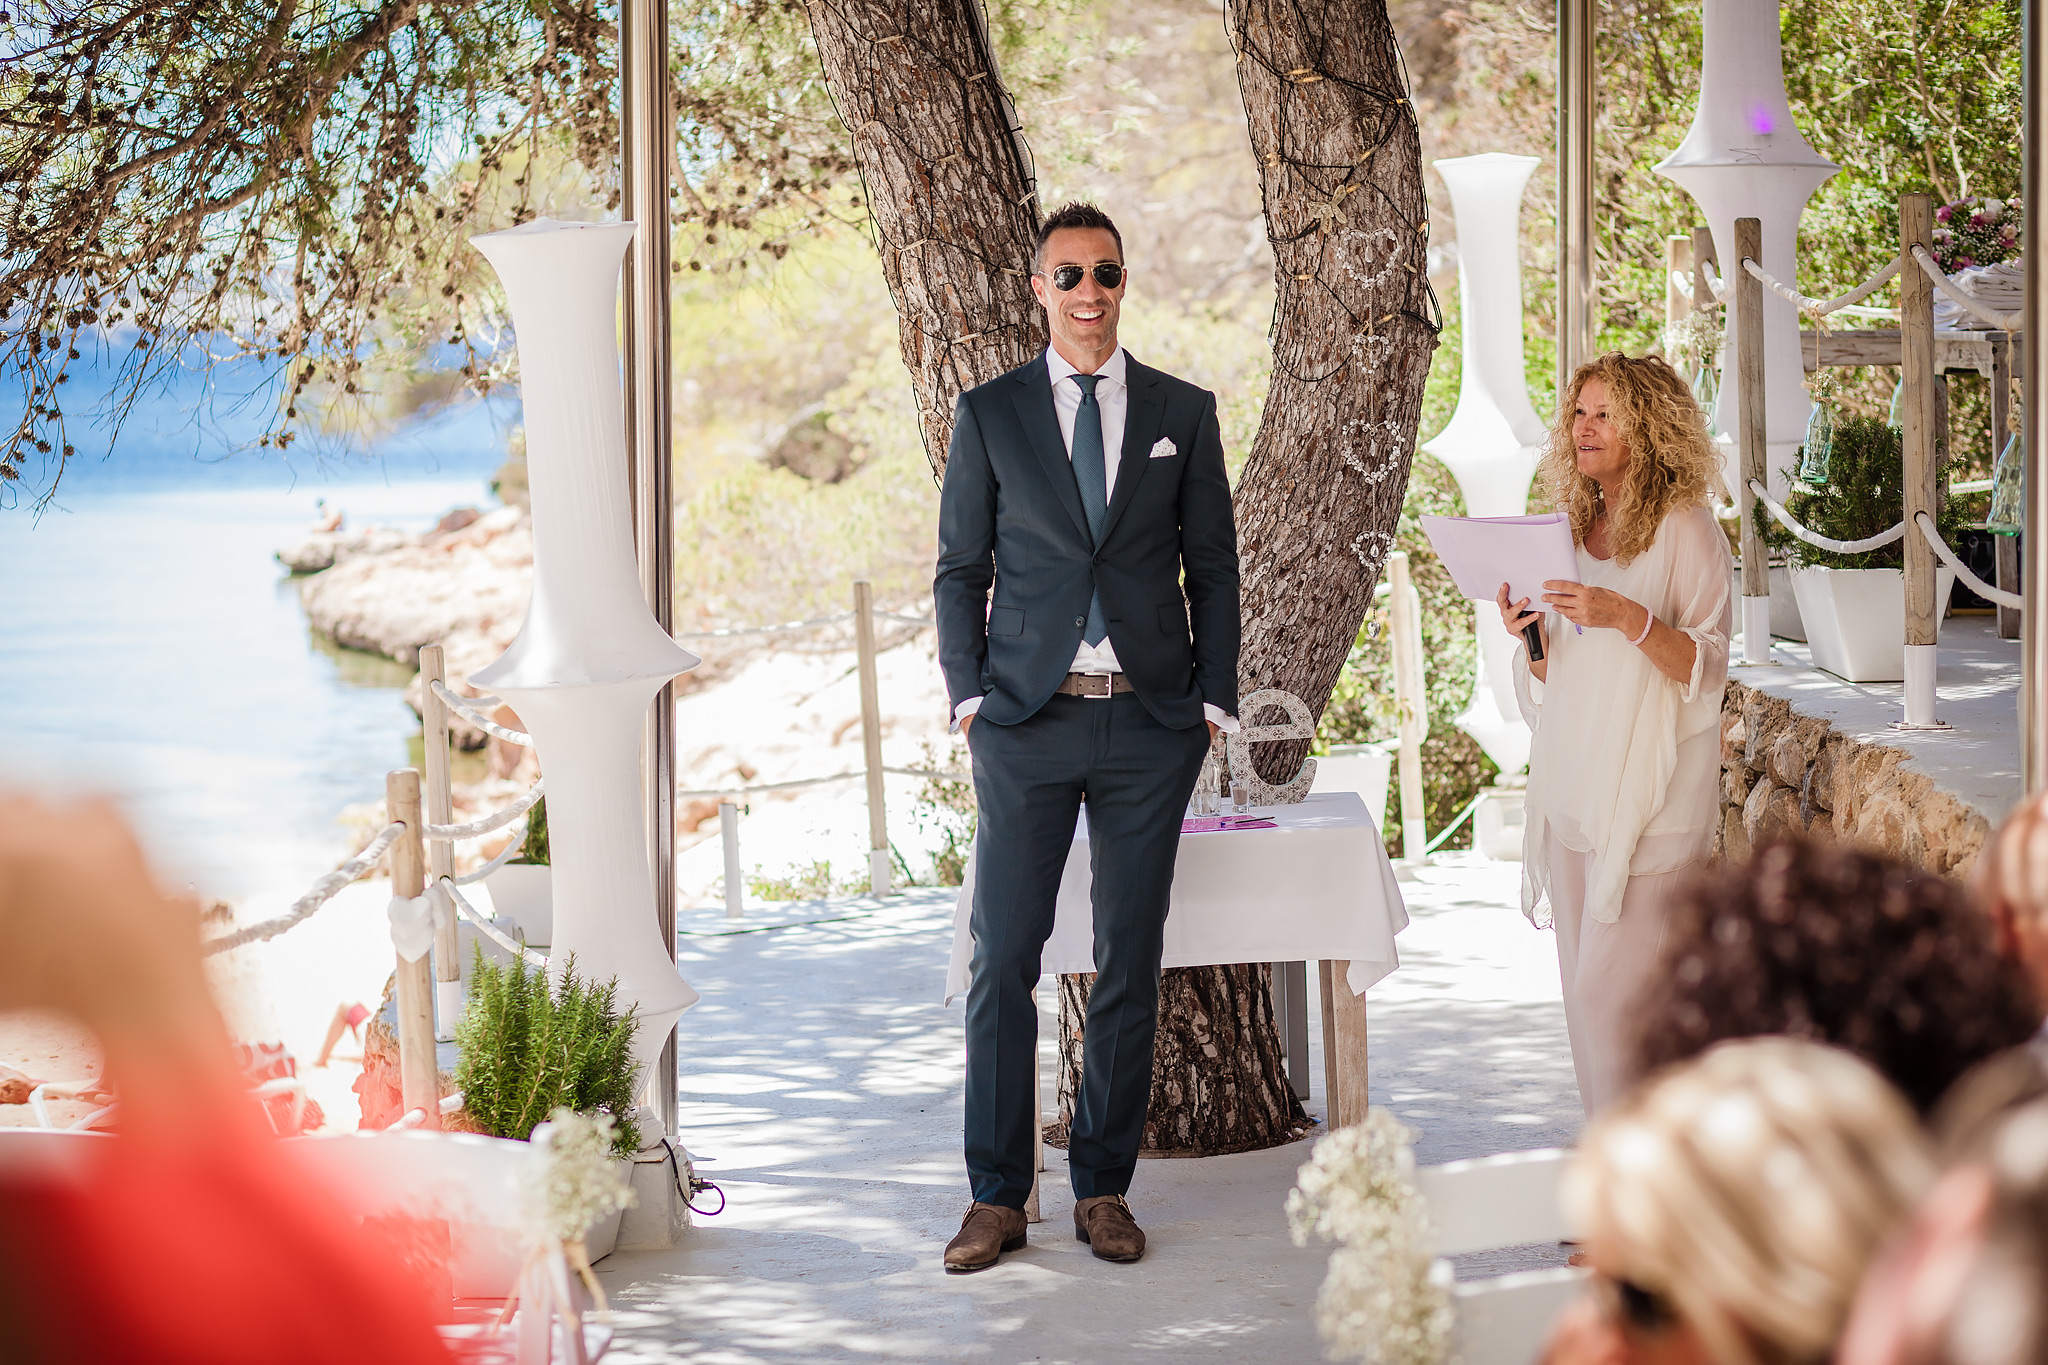 Bruidsreportage Destination Wedding Ibiza Mandy en Joost 011 - Bas Driessen Fotografie